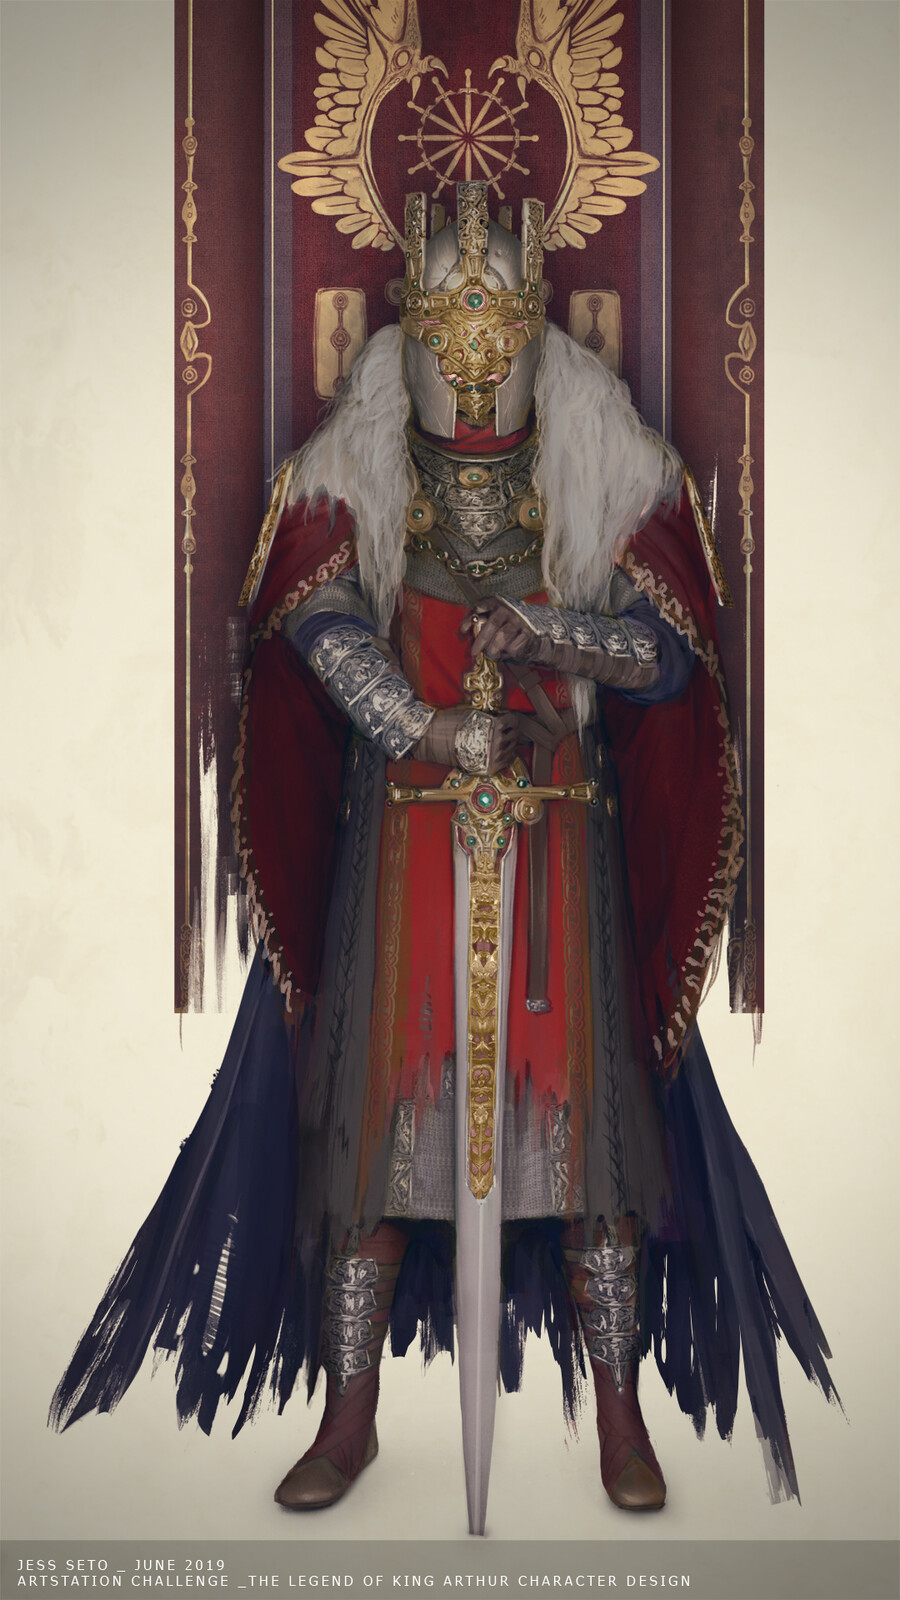 Artstation Challenge The Legend of King Arthur: King Arthur Pendragon